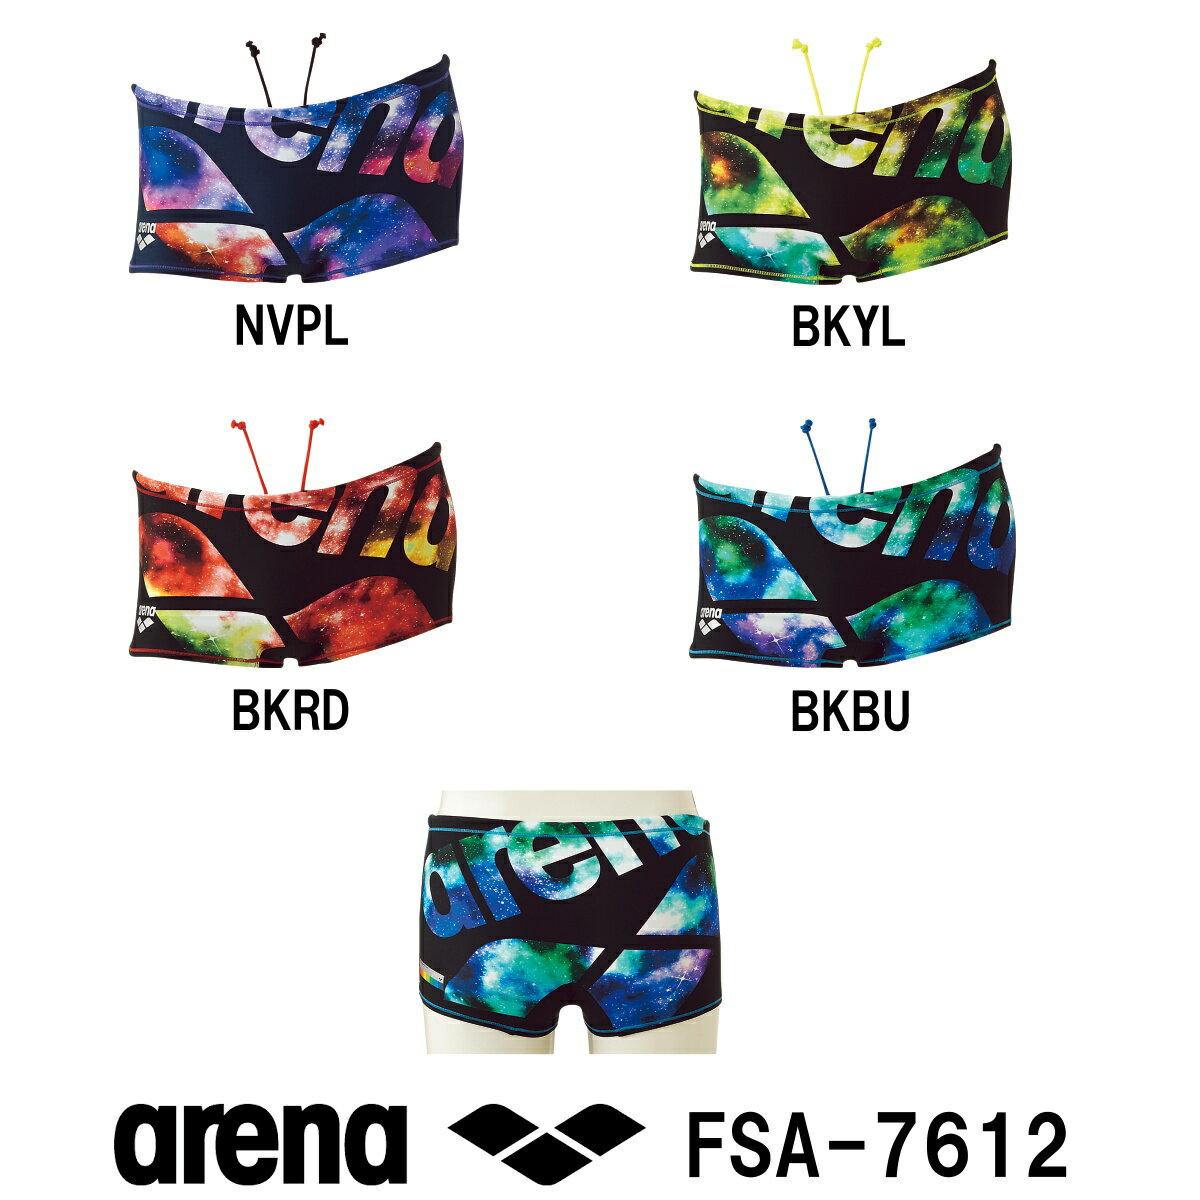 arena アリーナ 競泳練習用水着 メンズ スイムウェア スイミング ショートボックス タフスーツ タフスキンD 2017年FWモデル FSA-7612